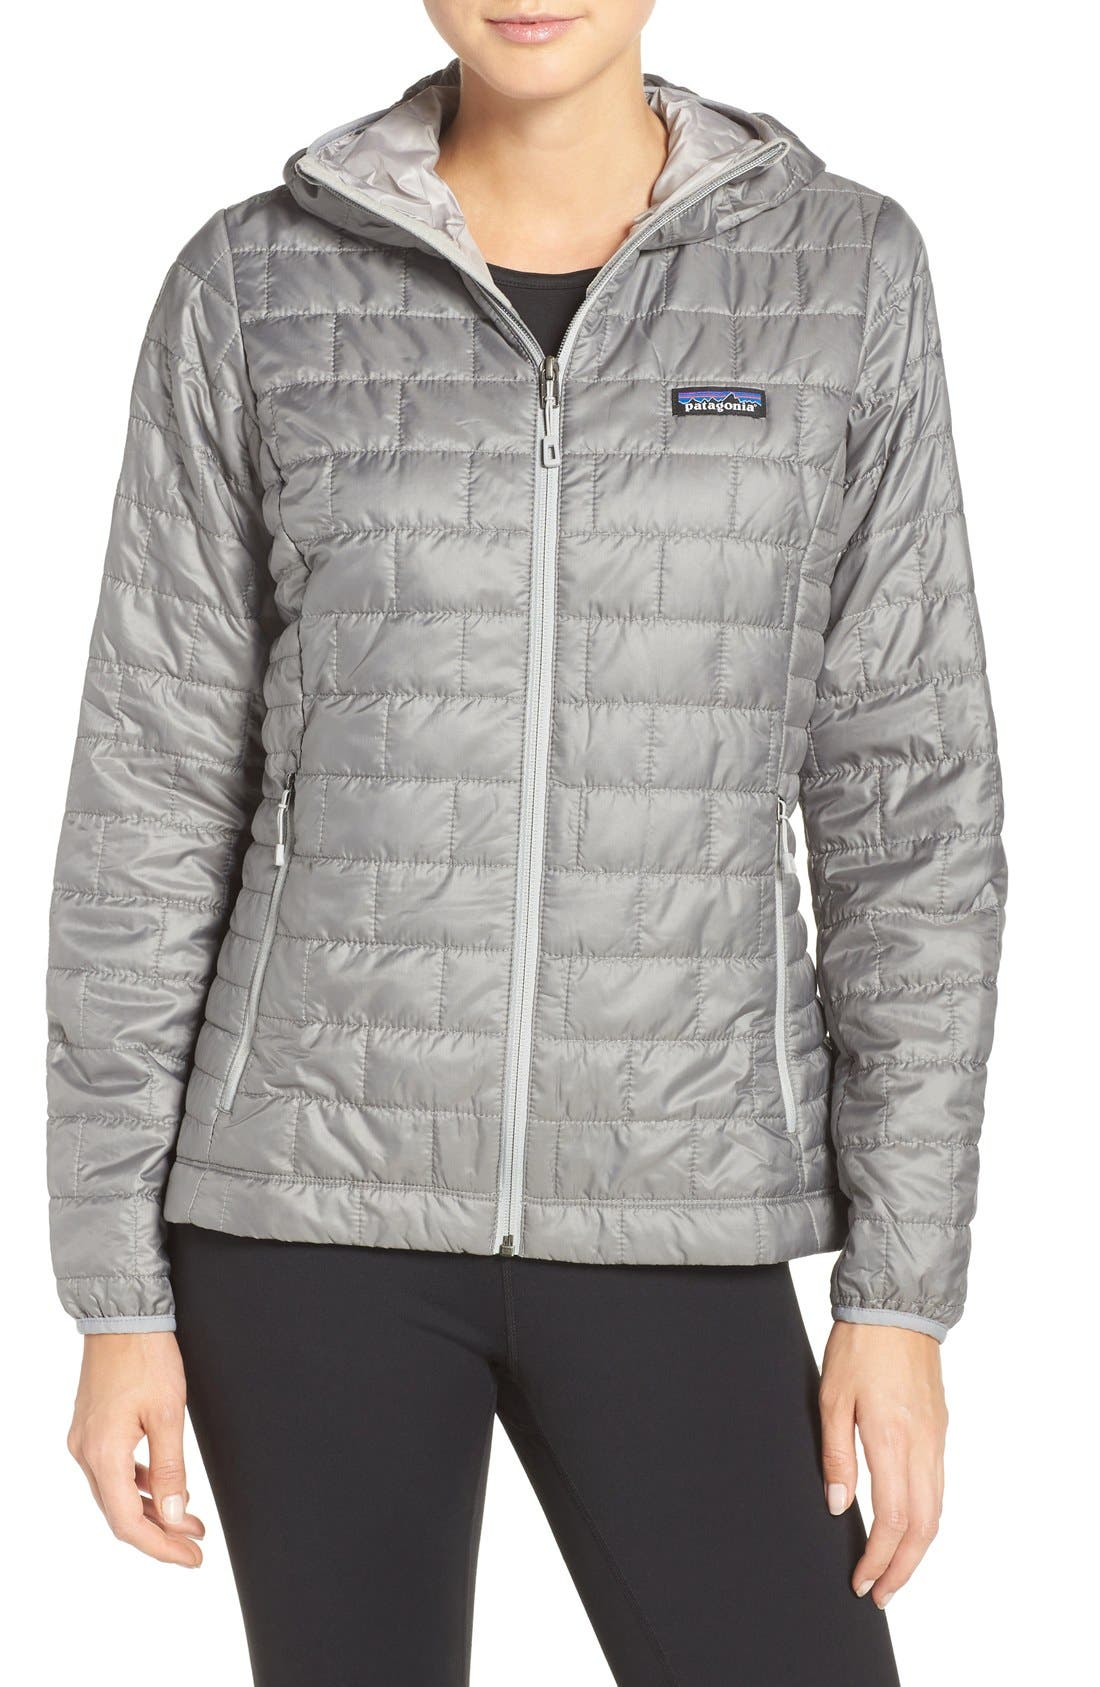 Patagonia Nano Puff Hooded Water Resistant Jacket, Grey